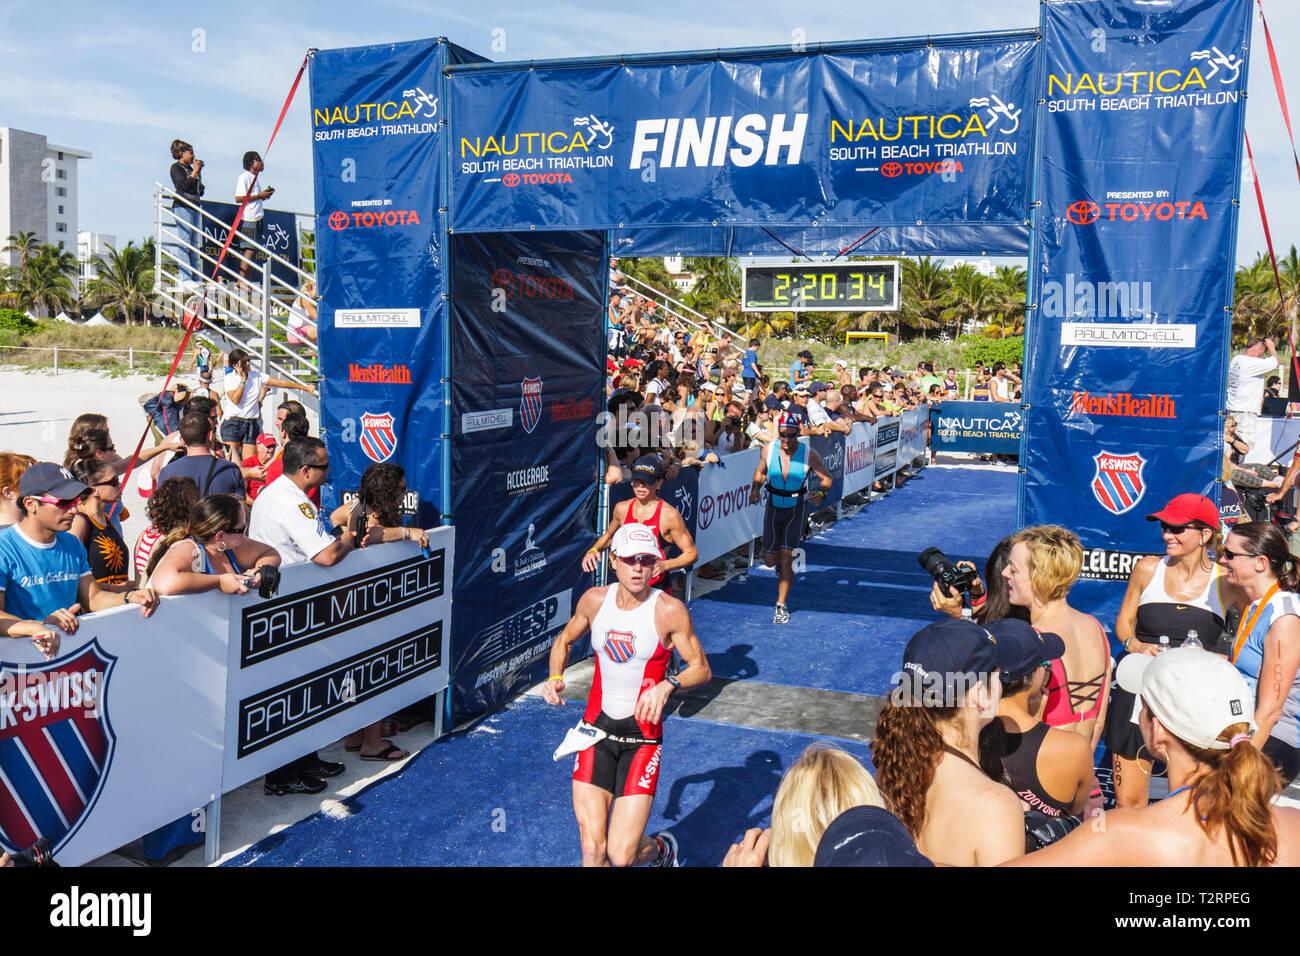 Miami Beach Florida Nautica South Beach Triathlon Atlantik Küste Sport Fitness Segment Athlet Konkurrenten Läufer laufen Stockfoto